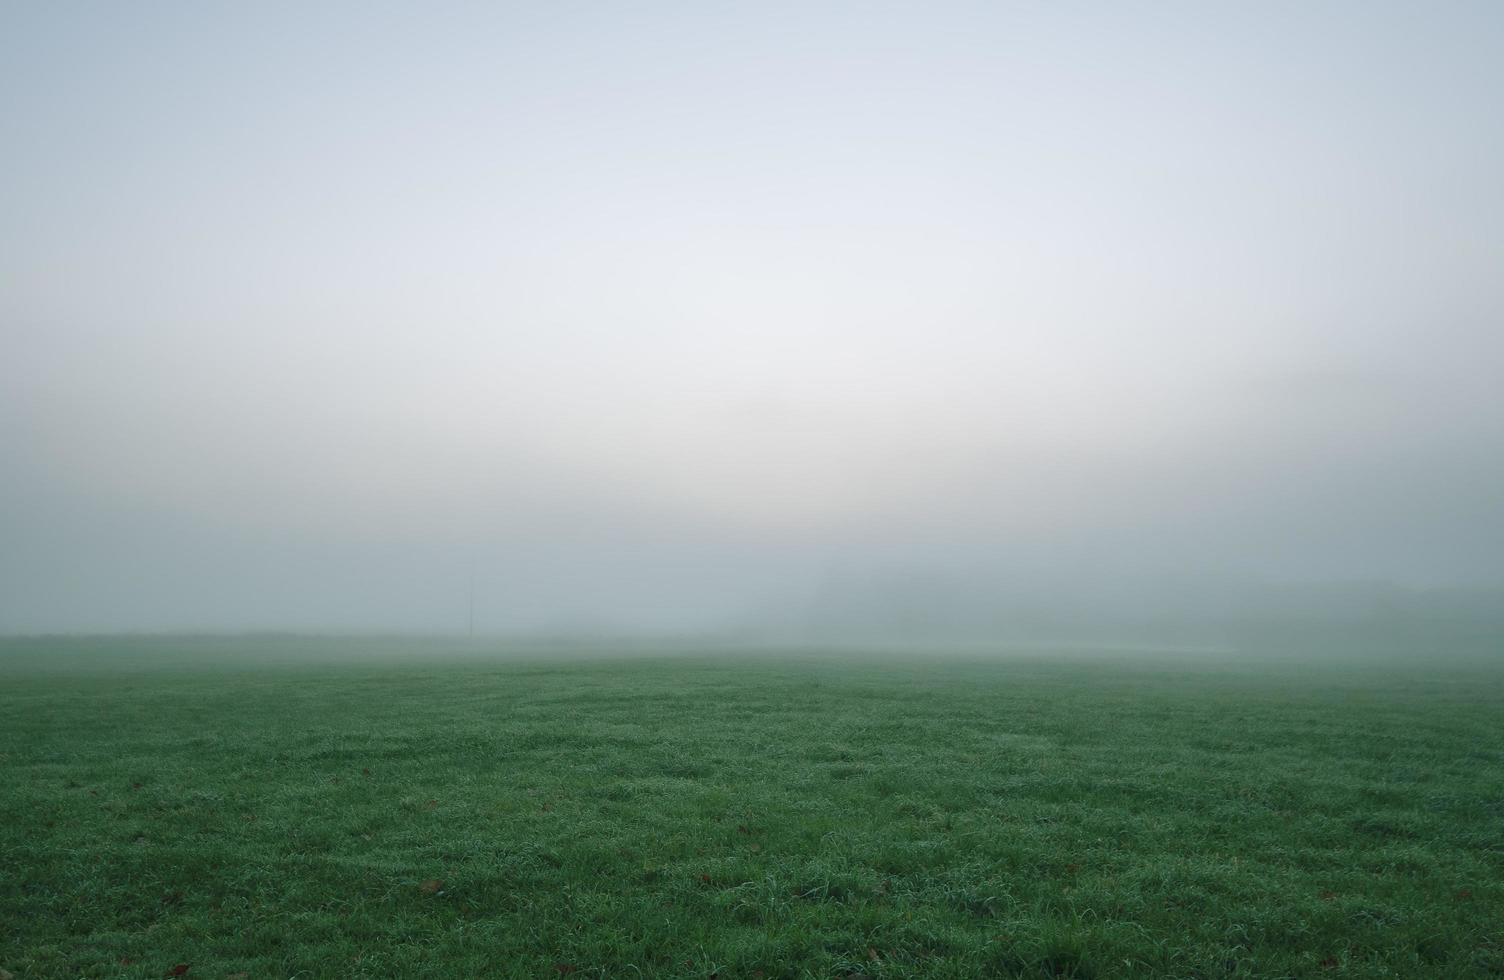 Foggy green grassy field photo